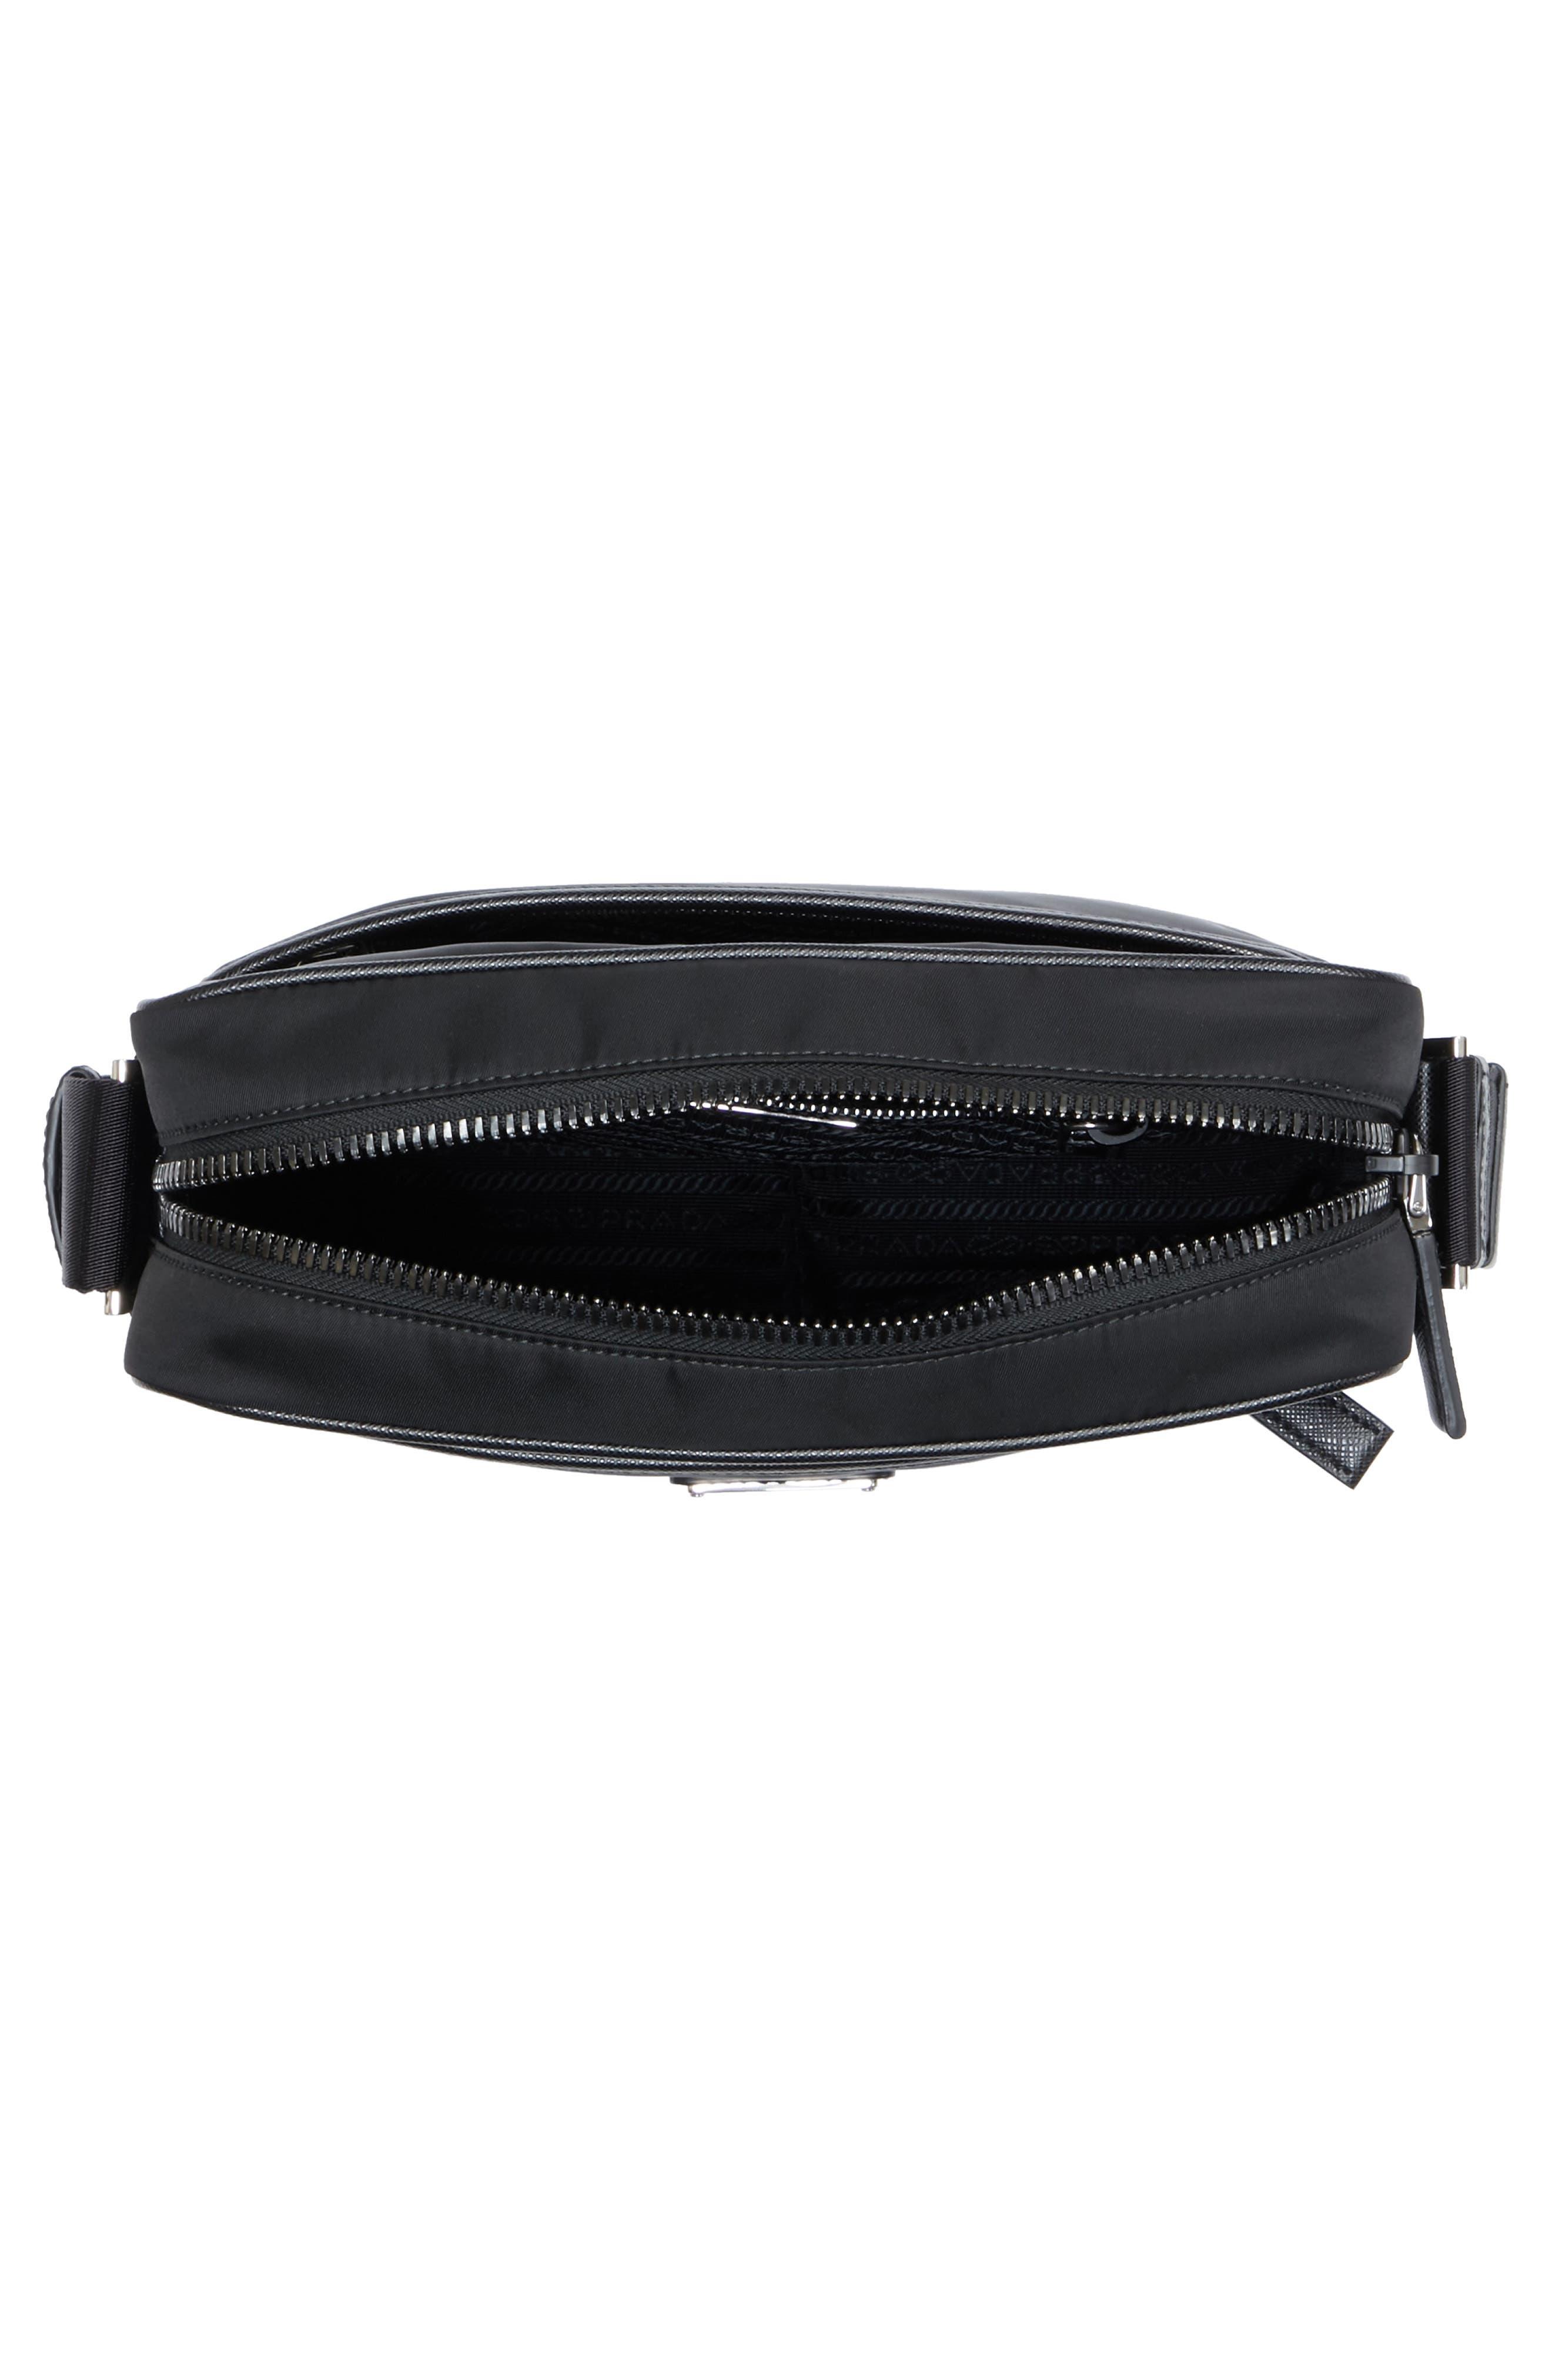 Saffiano Leather Crossbody Bag,                             Alternate thumbnail 3, color,                             Nero